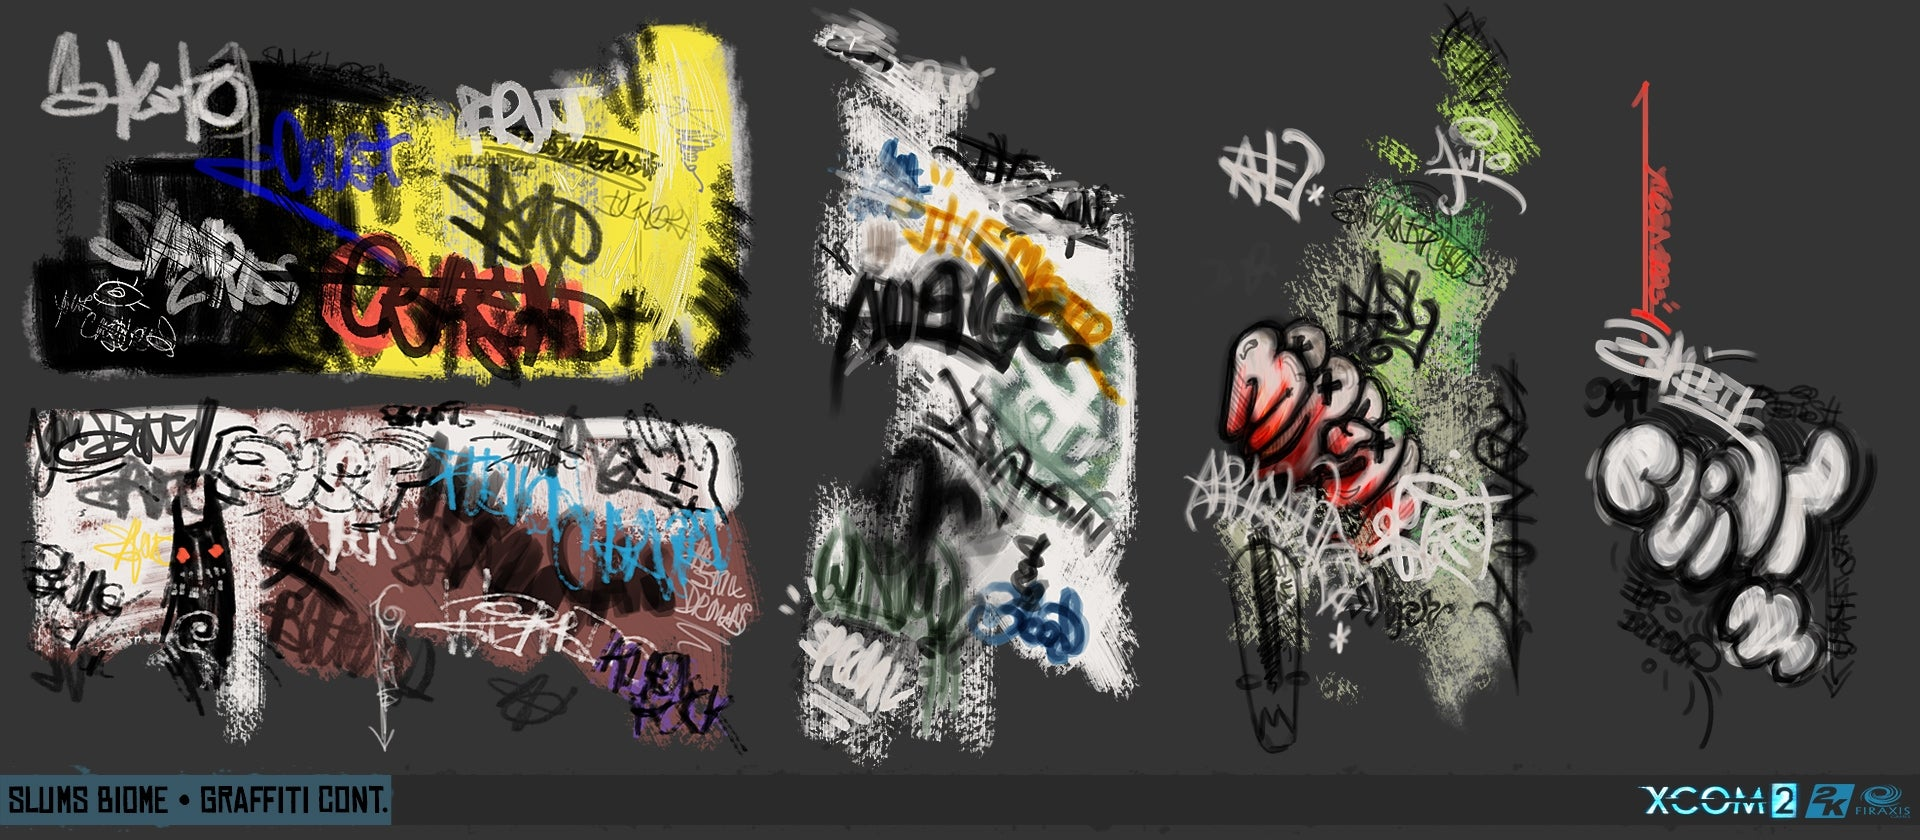 The People, Guns & Graffiti Of XCOM 2